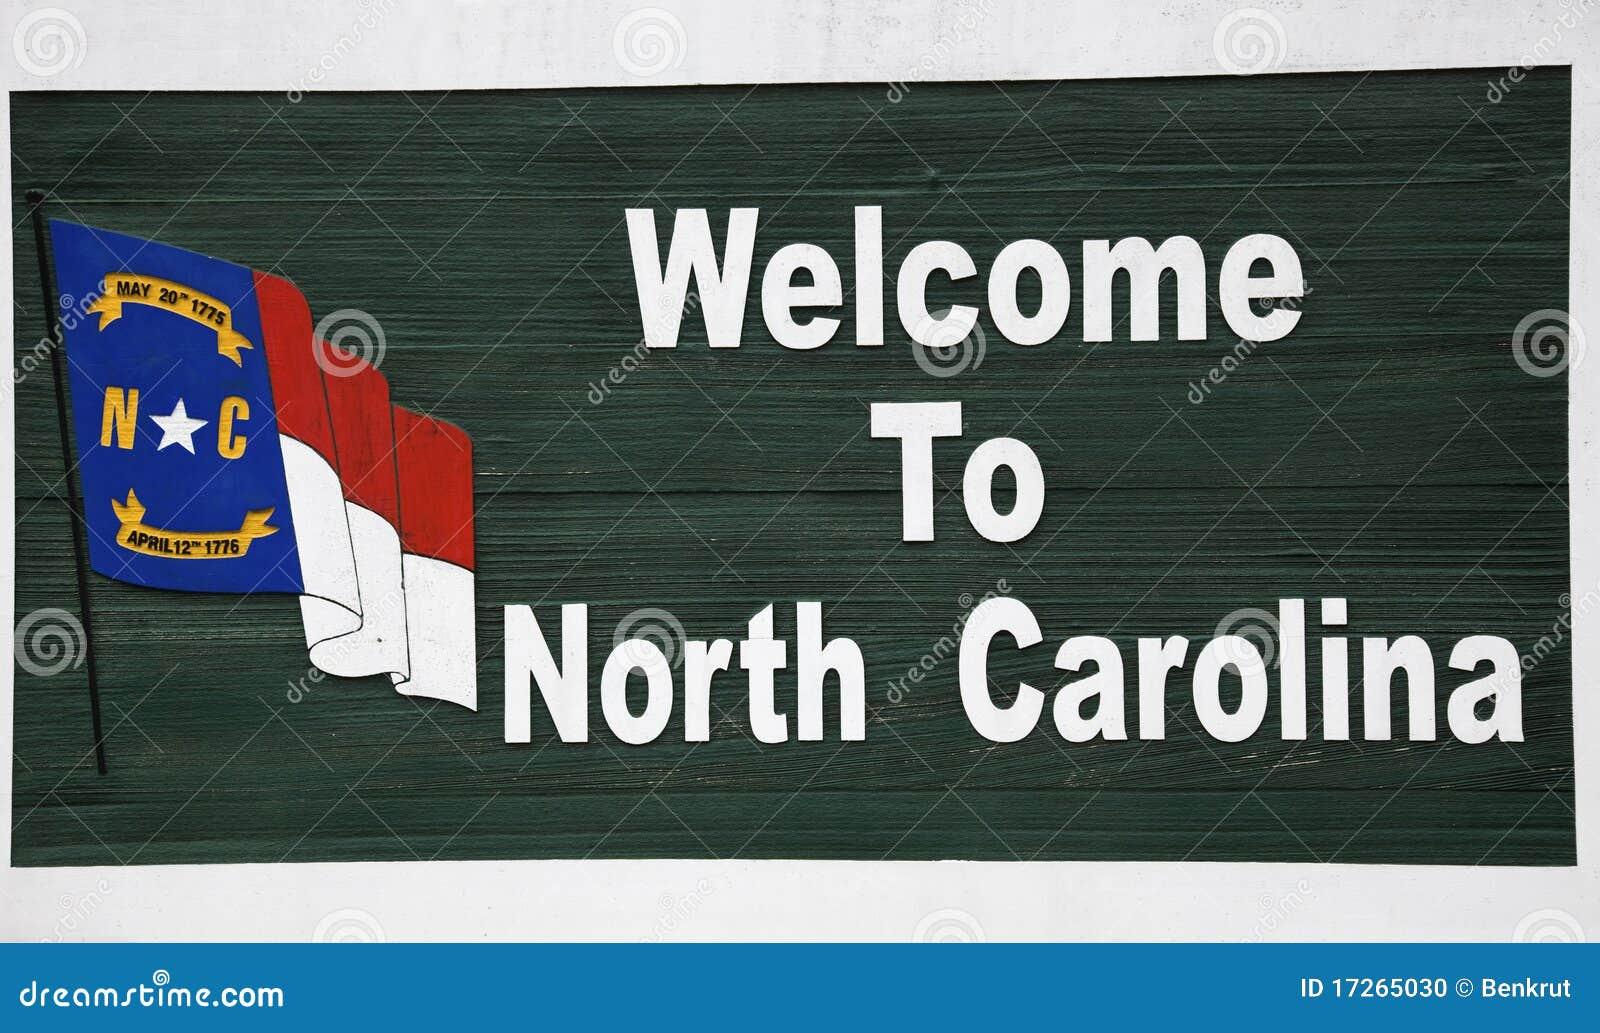 North carolina welcomes visitors essay